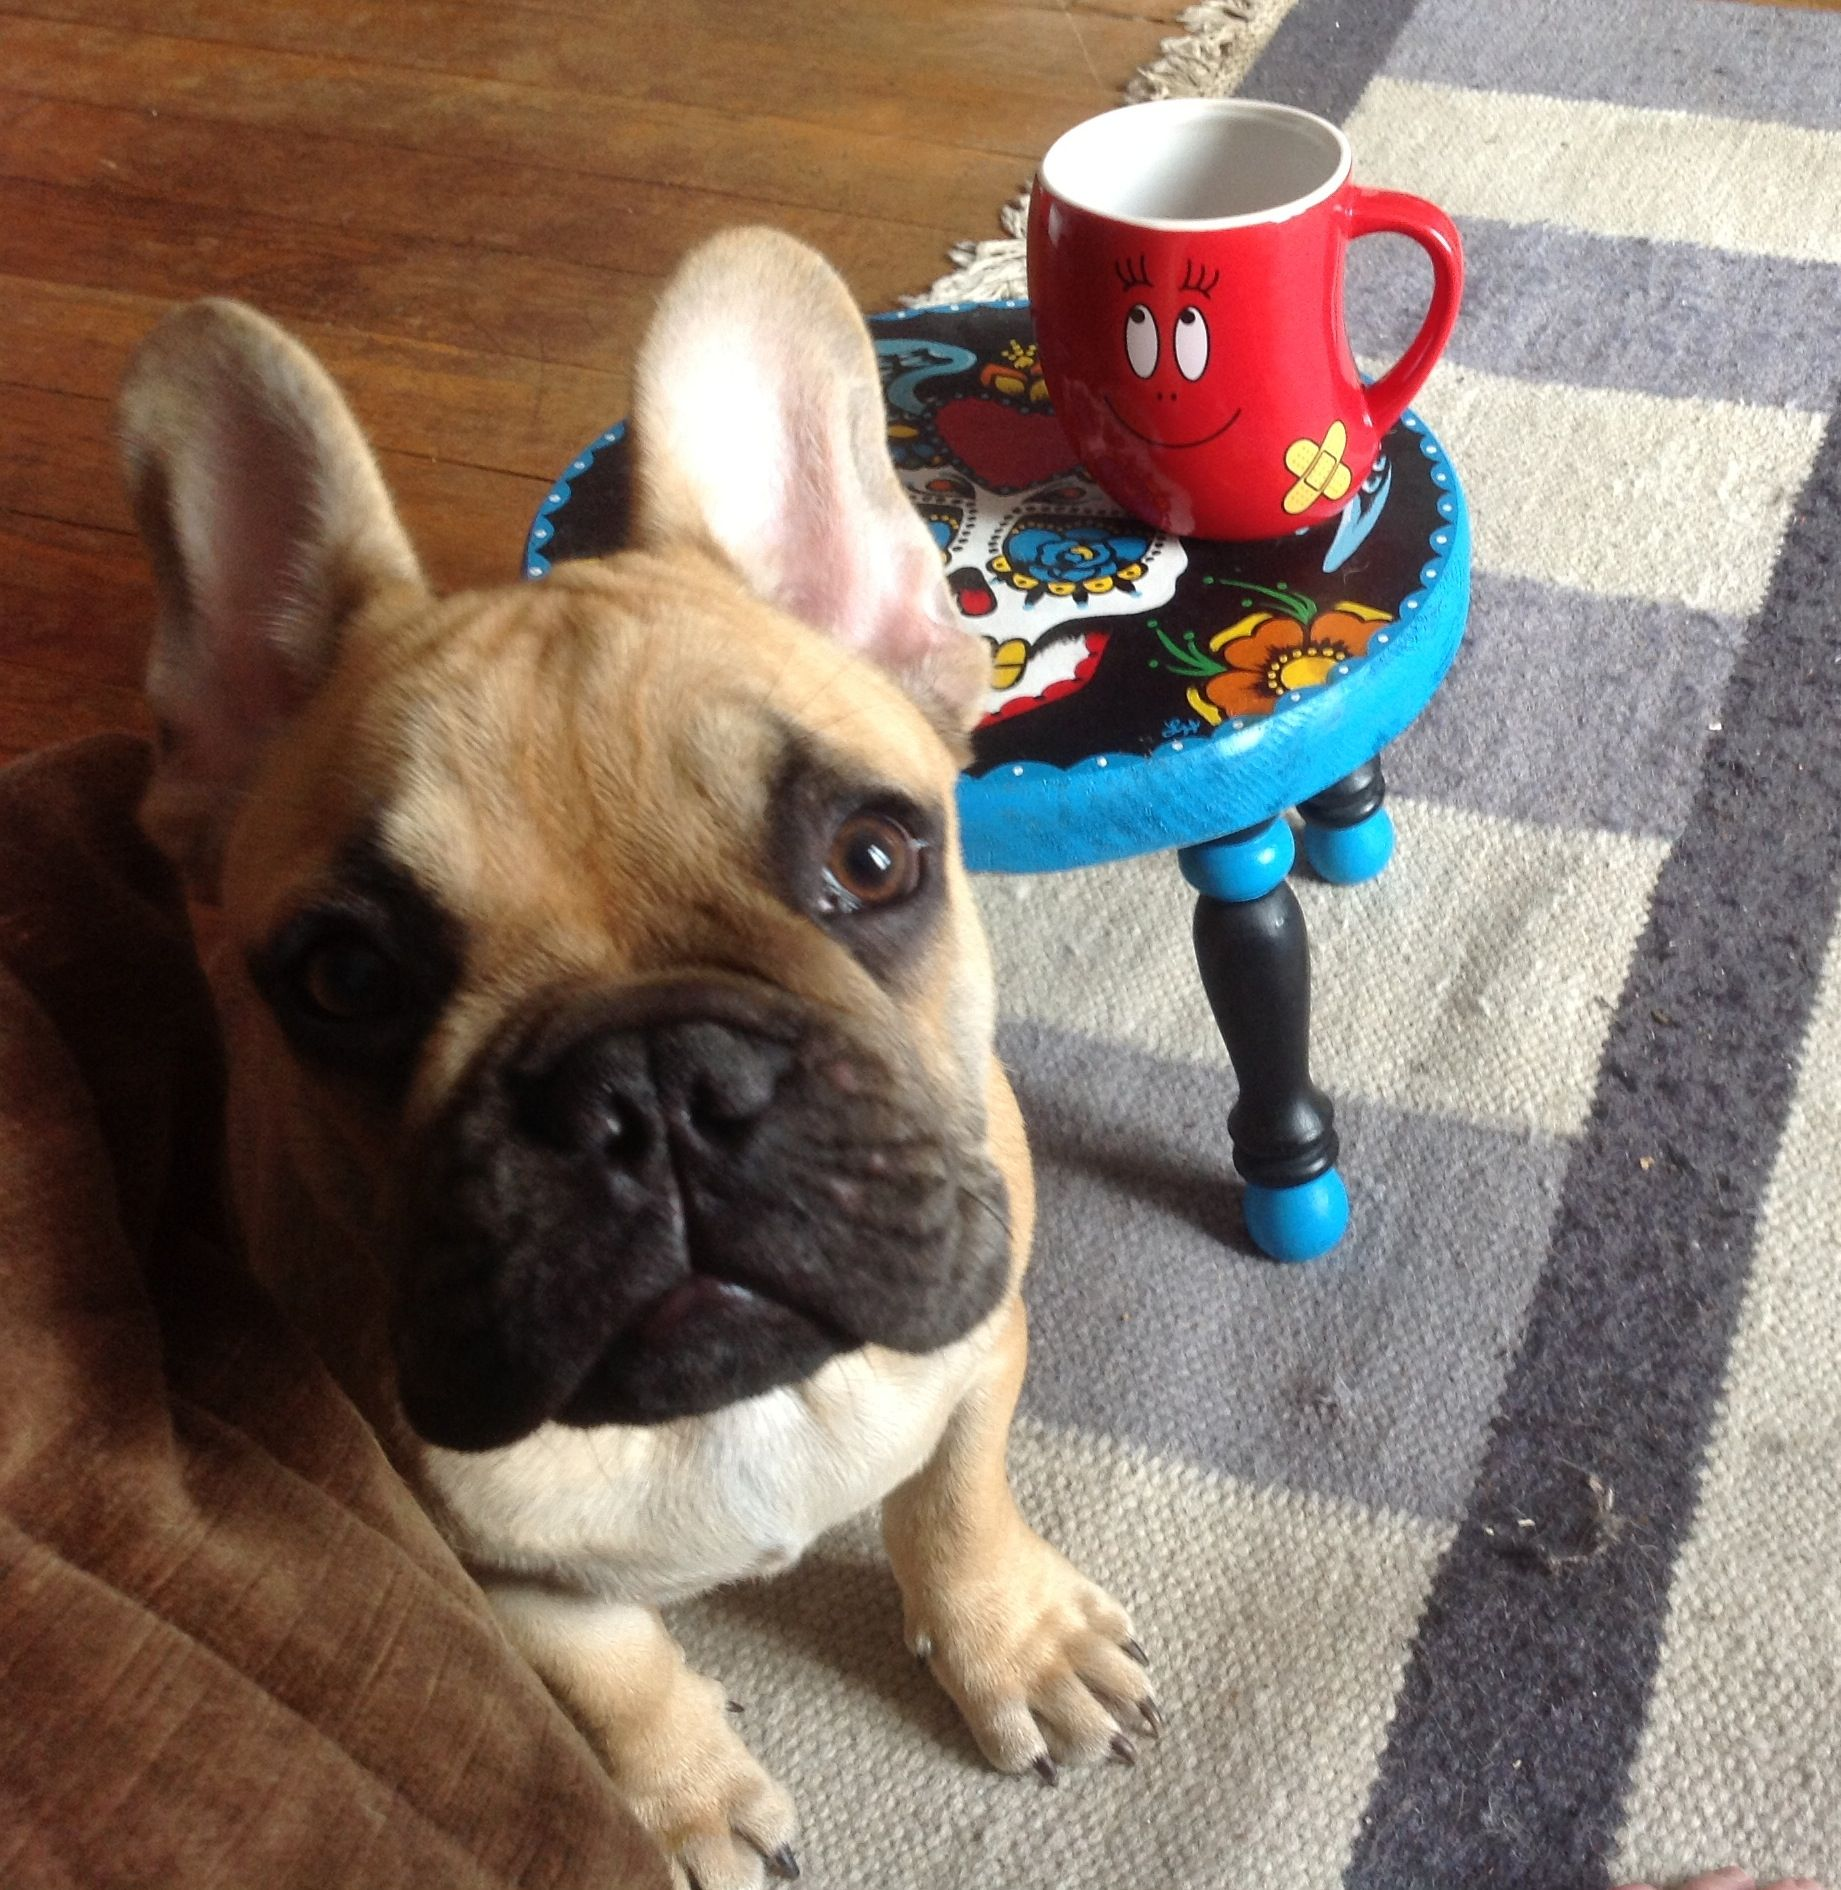 Georges French Bulldog Bully Dog Dog Love Cute Animals